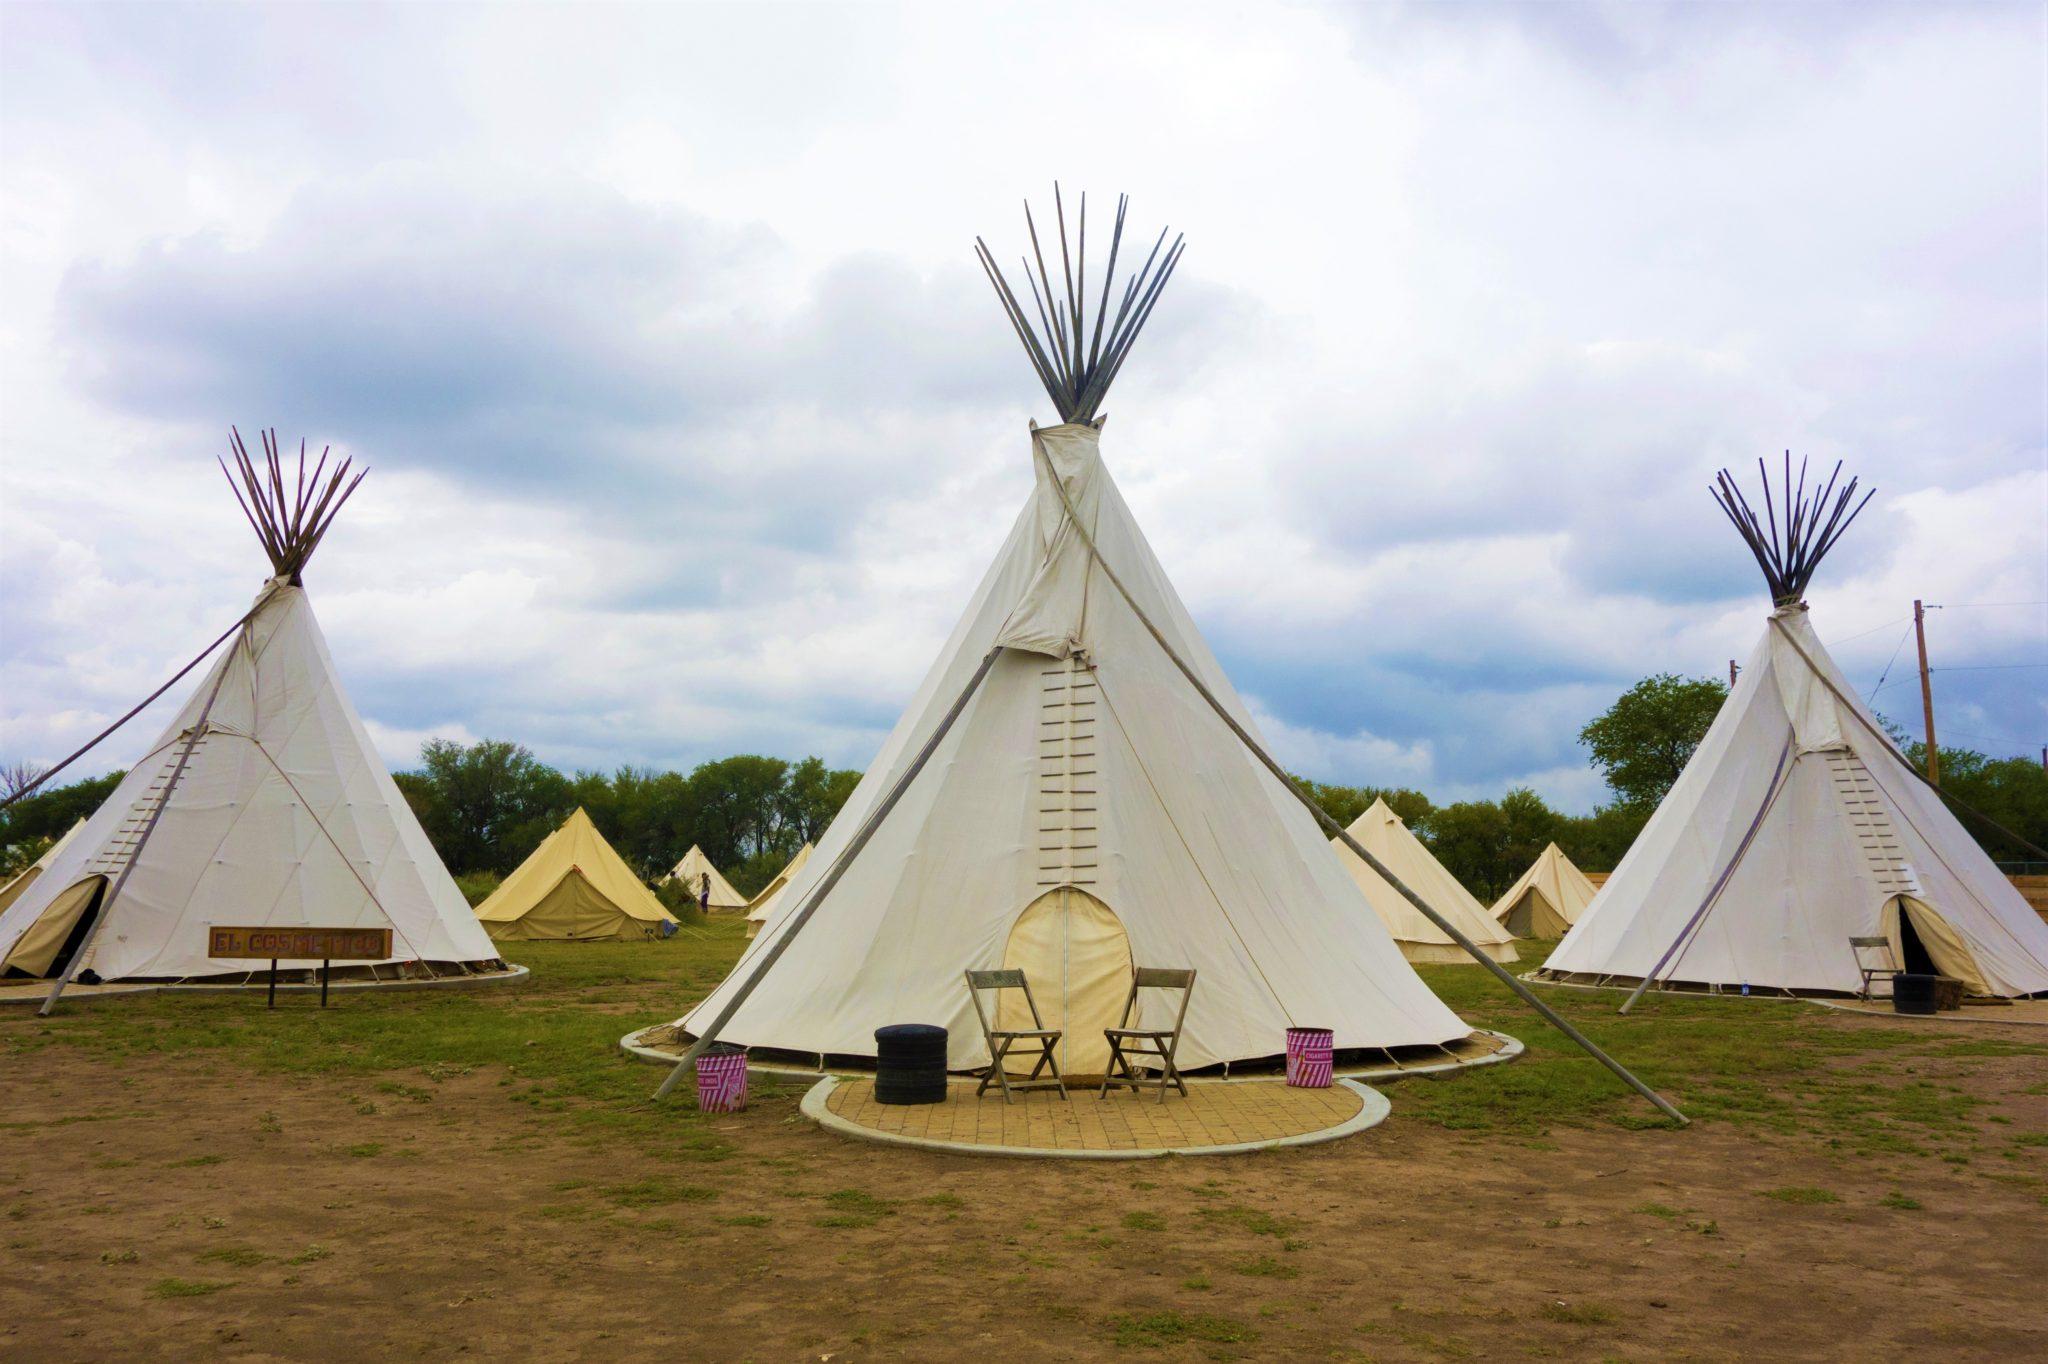 Marfa, West Texas - Fall Travel Ideas from Dallas